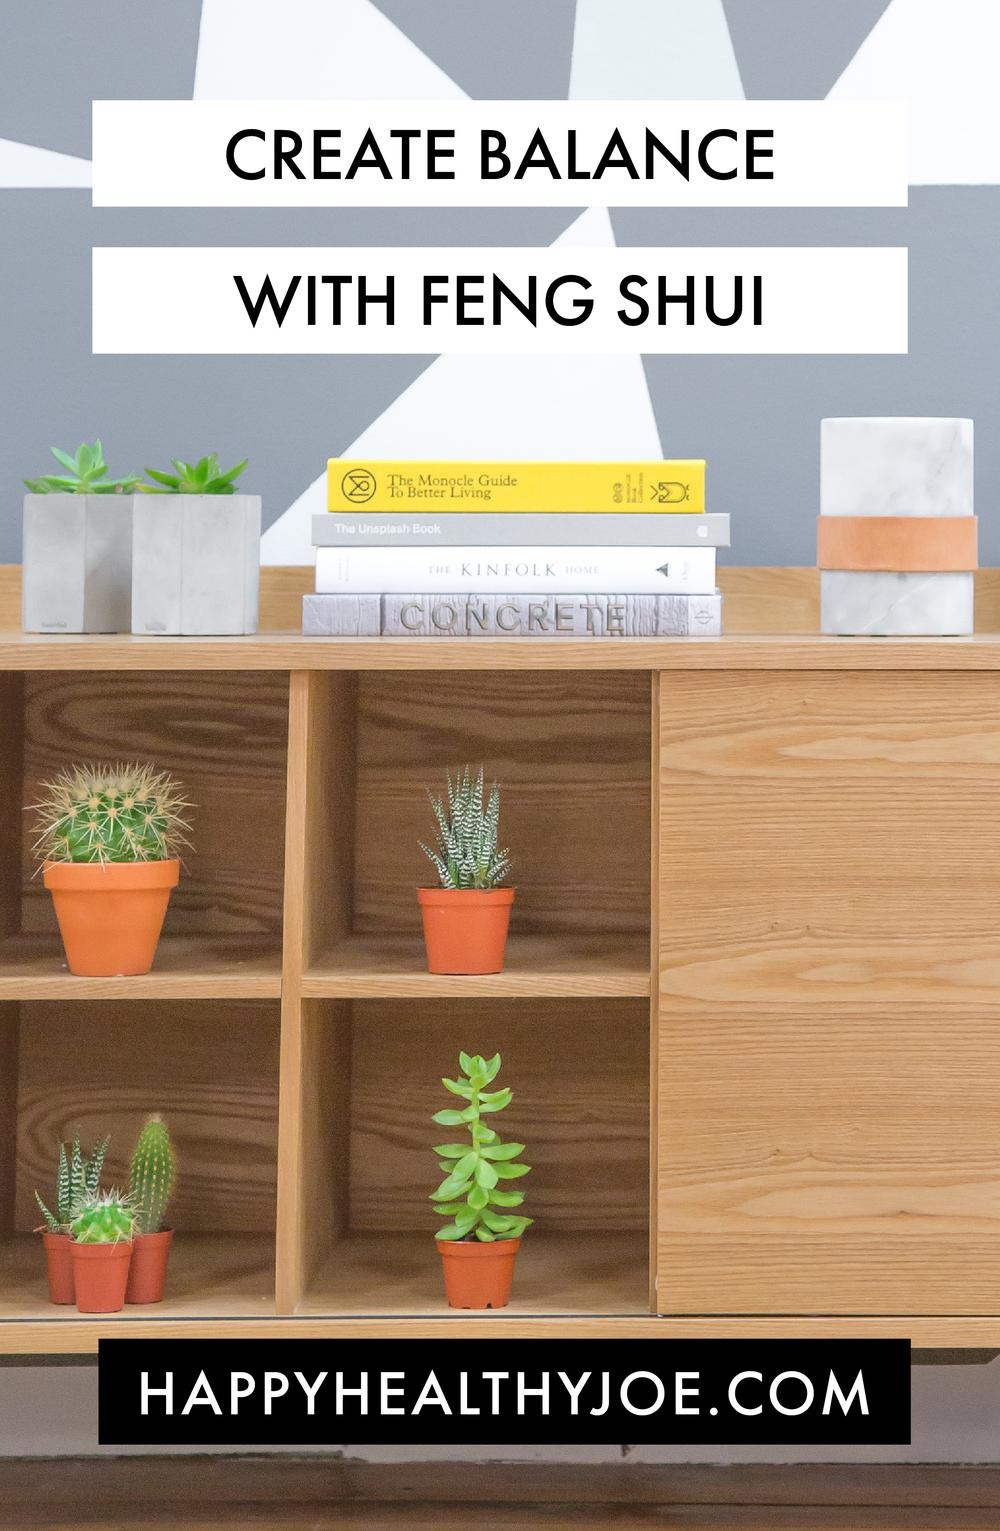 7 WAYS TO CREATE BALANCE WITH FENG SHUI HAPPY HEALTHY JOE